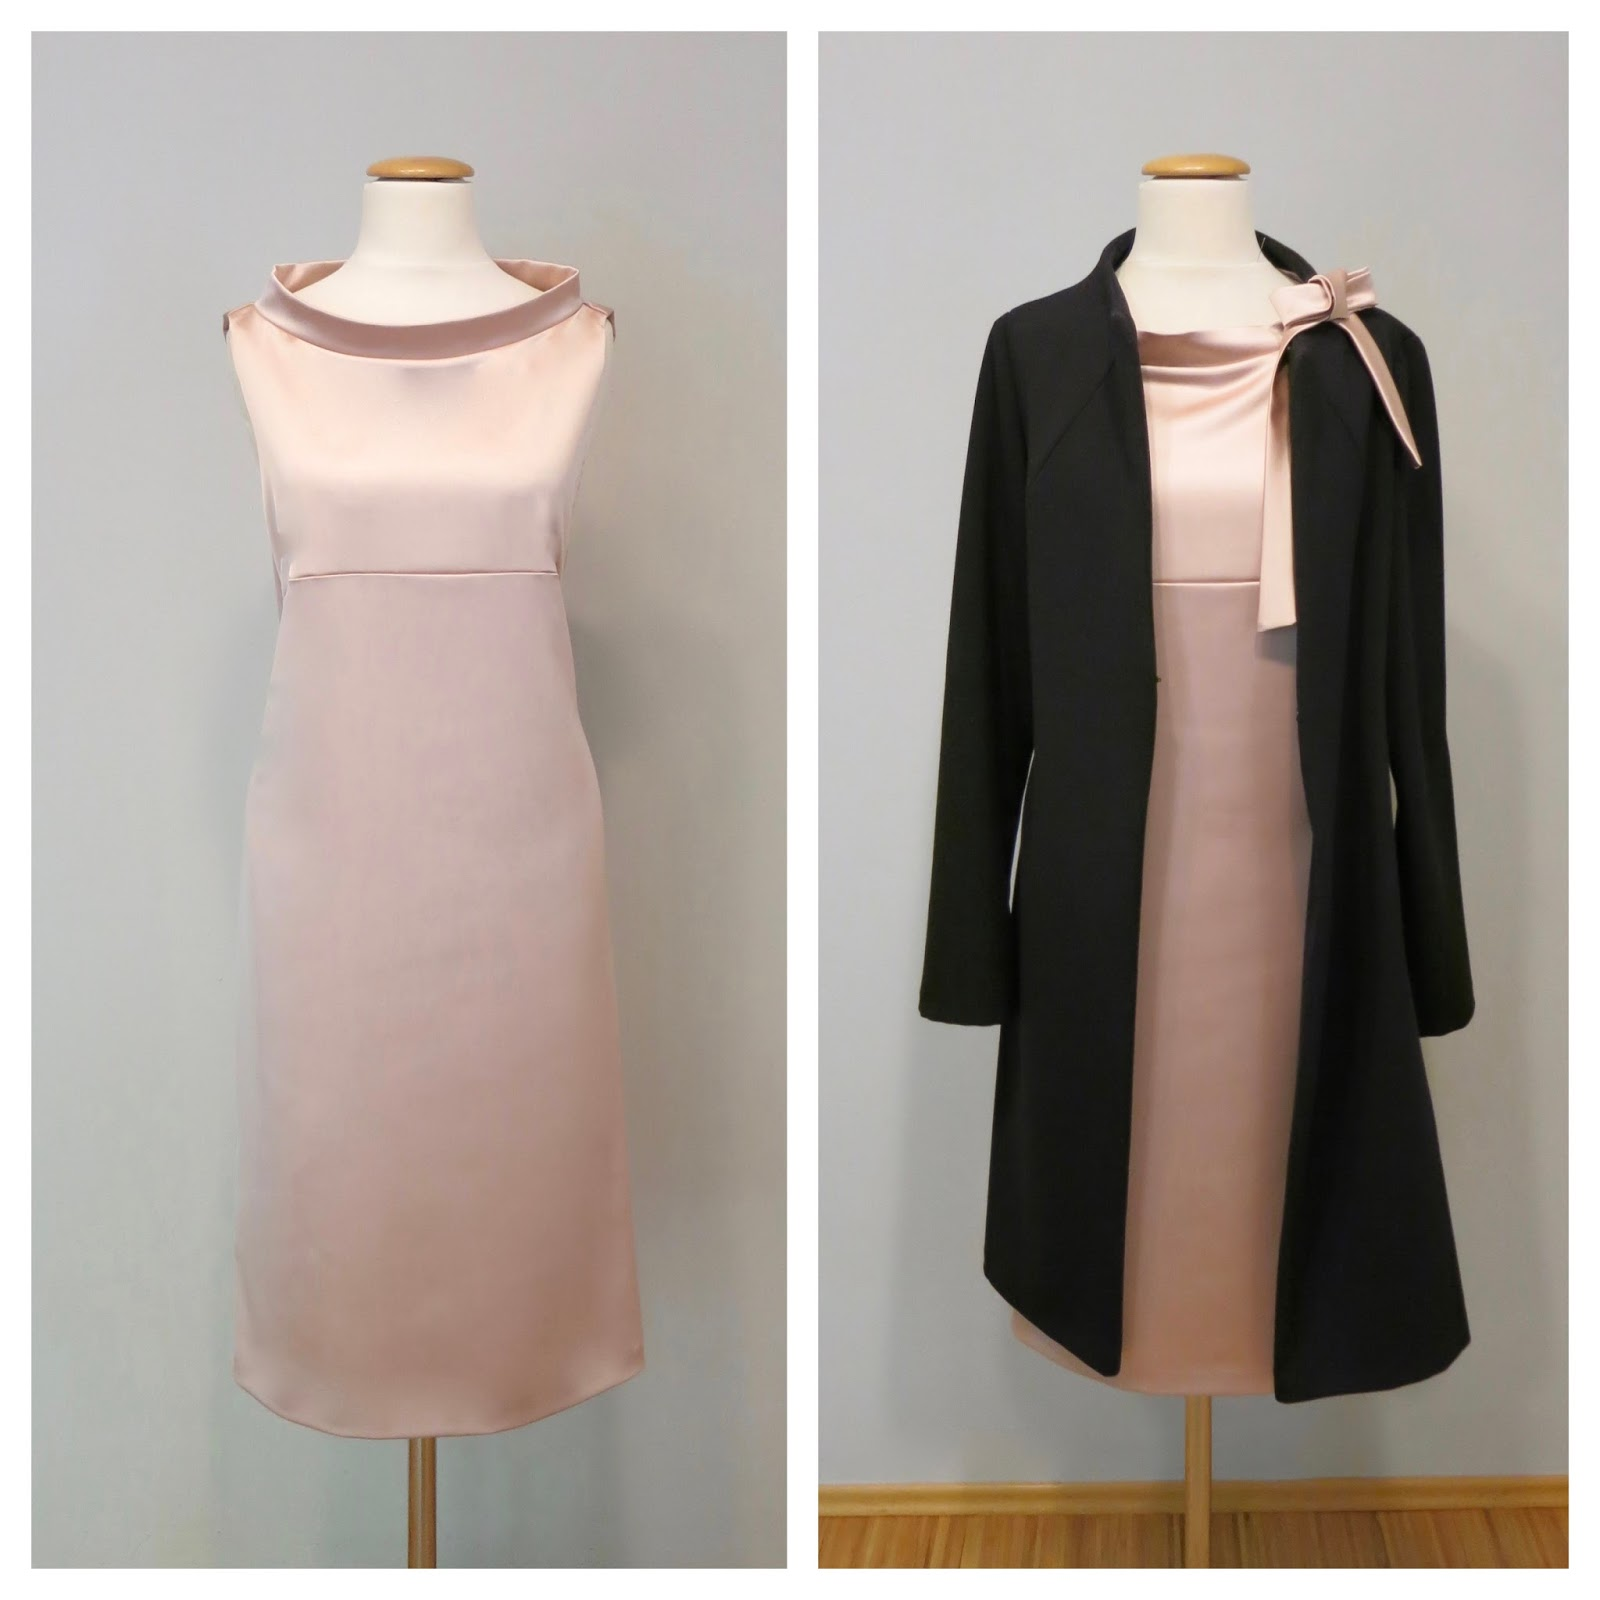 Lea Kovats: Rosa Kleid mit Mantel